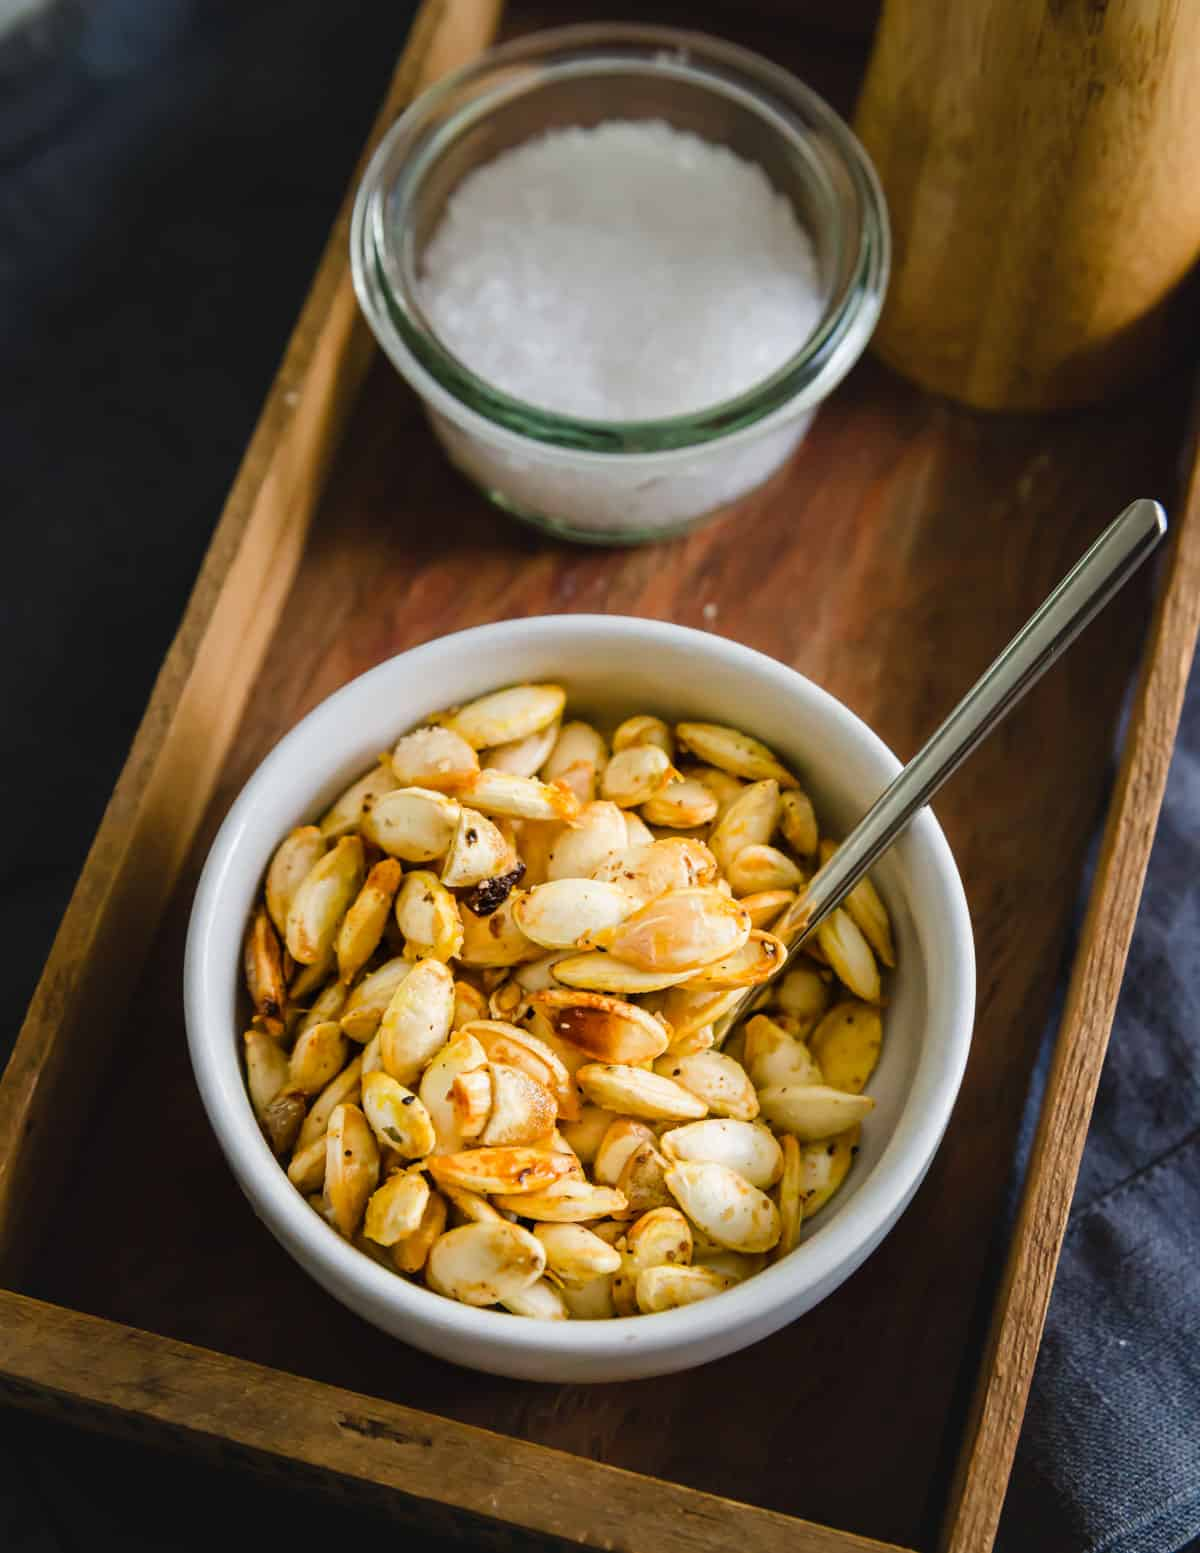 Crispy, golden roasted winter squash seeds seasoned with olive oil, salt and pepper